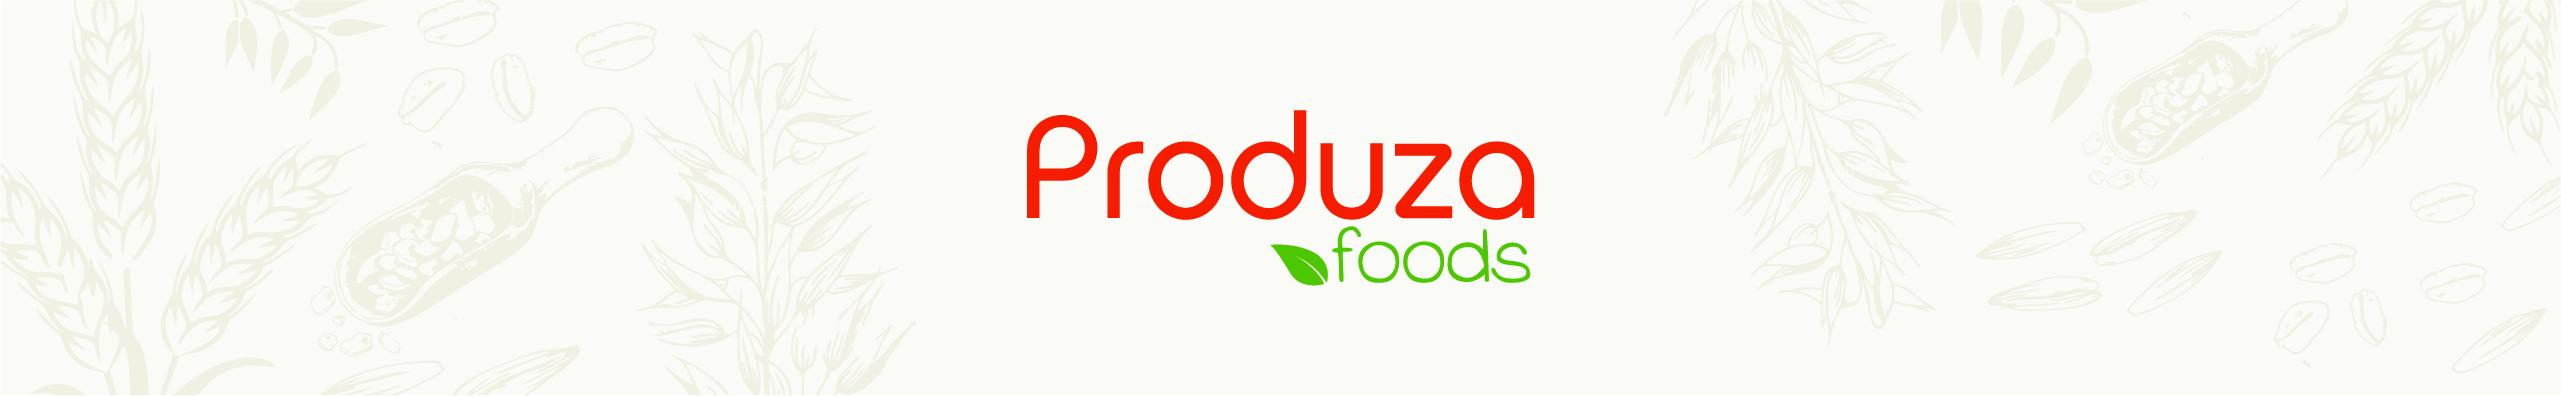 Produza Foods